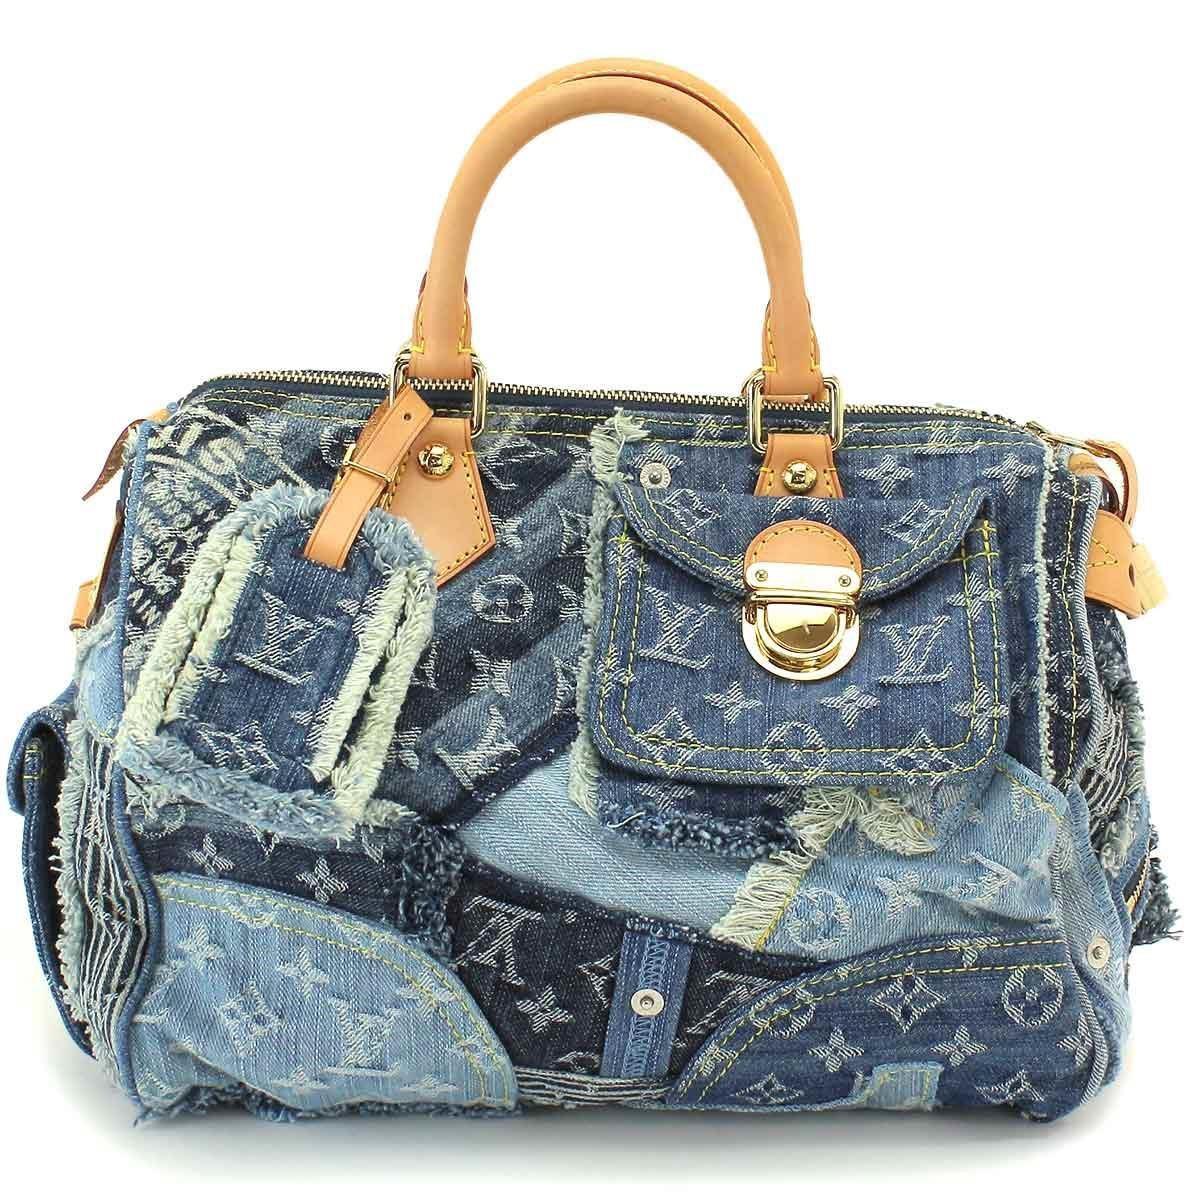 49d405e2e75f Lyst - Louis Vuitton Monogram Denim Patchwork Speedy 30 Hand Bag ...